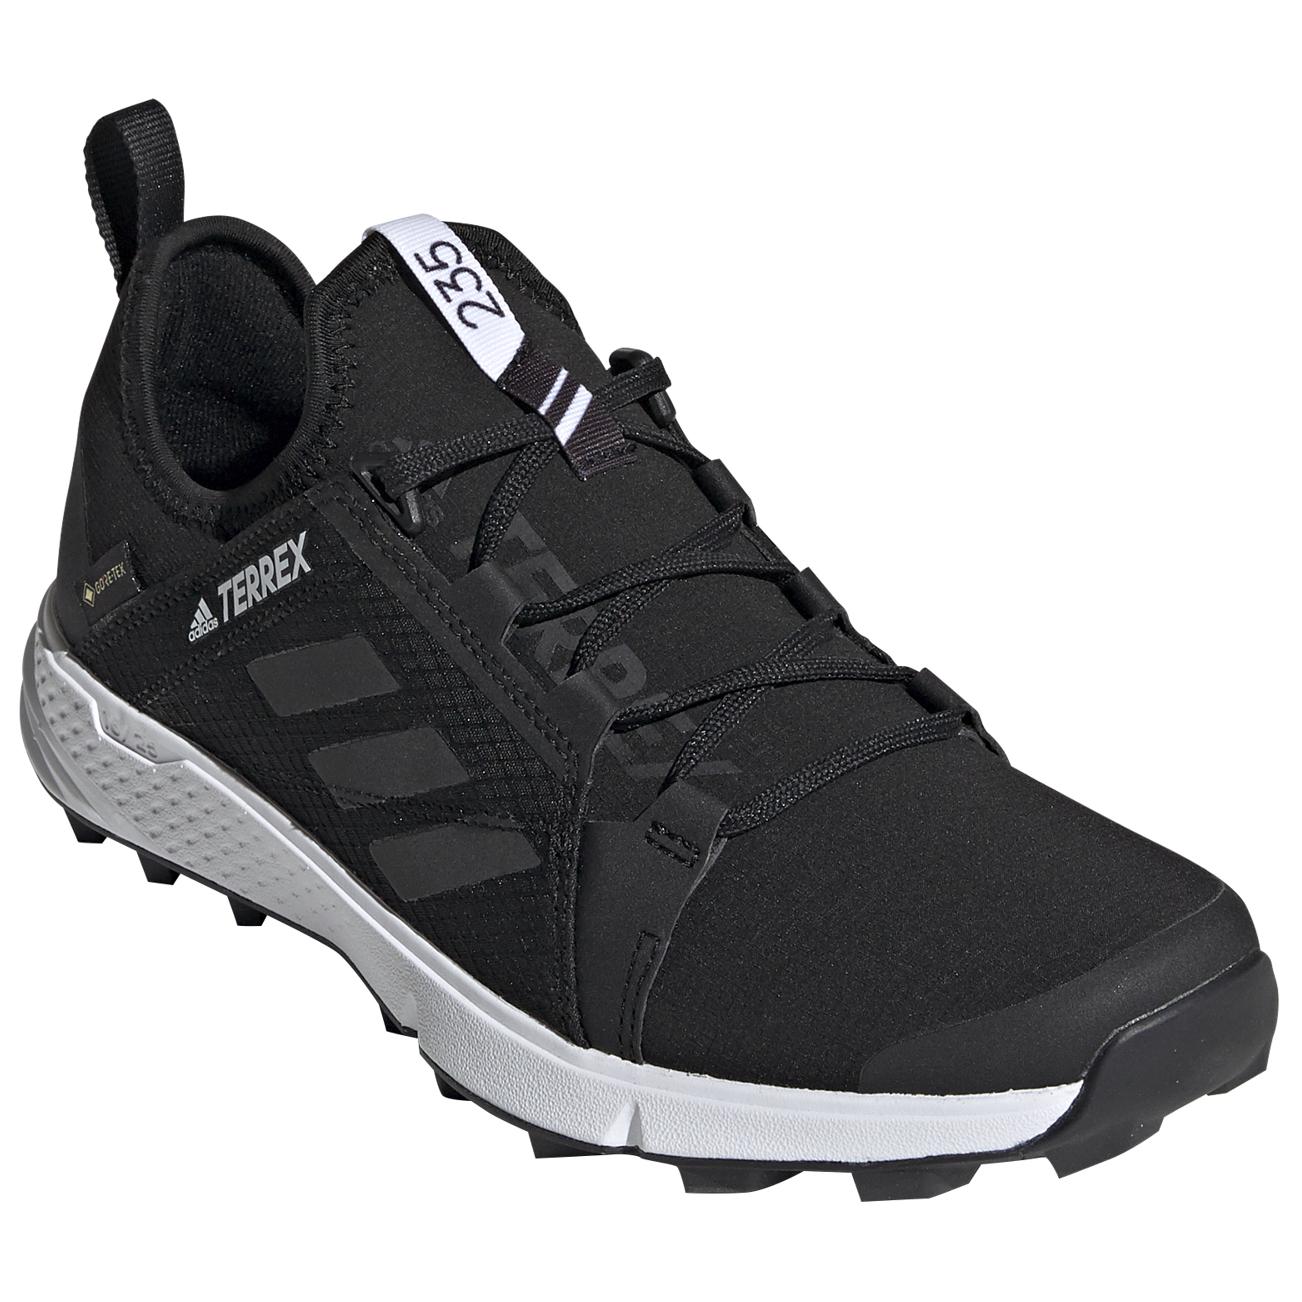 adidas - Women's Terrex Agravic Speed GTX - Trail running shoes - Core  Black / Core Black / Ftw White | 4 (UK)